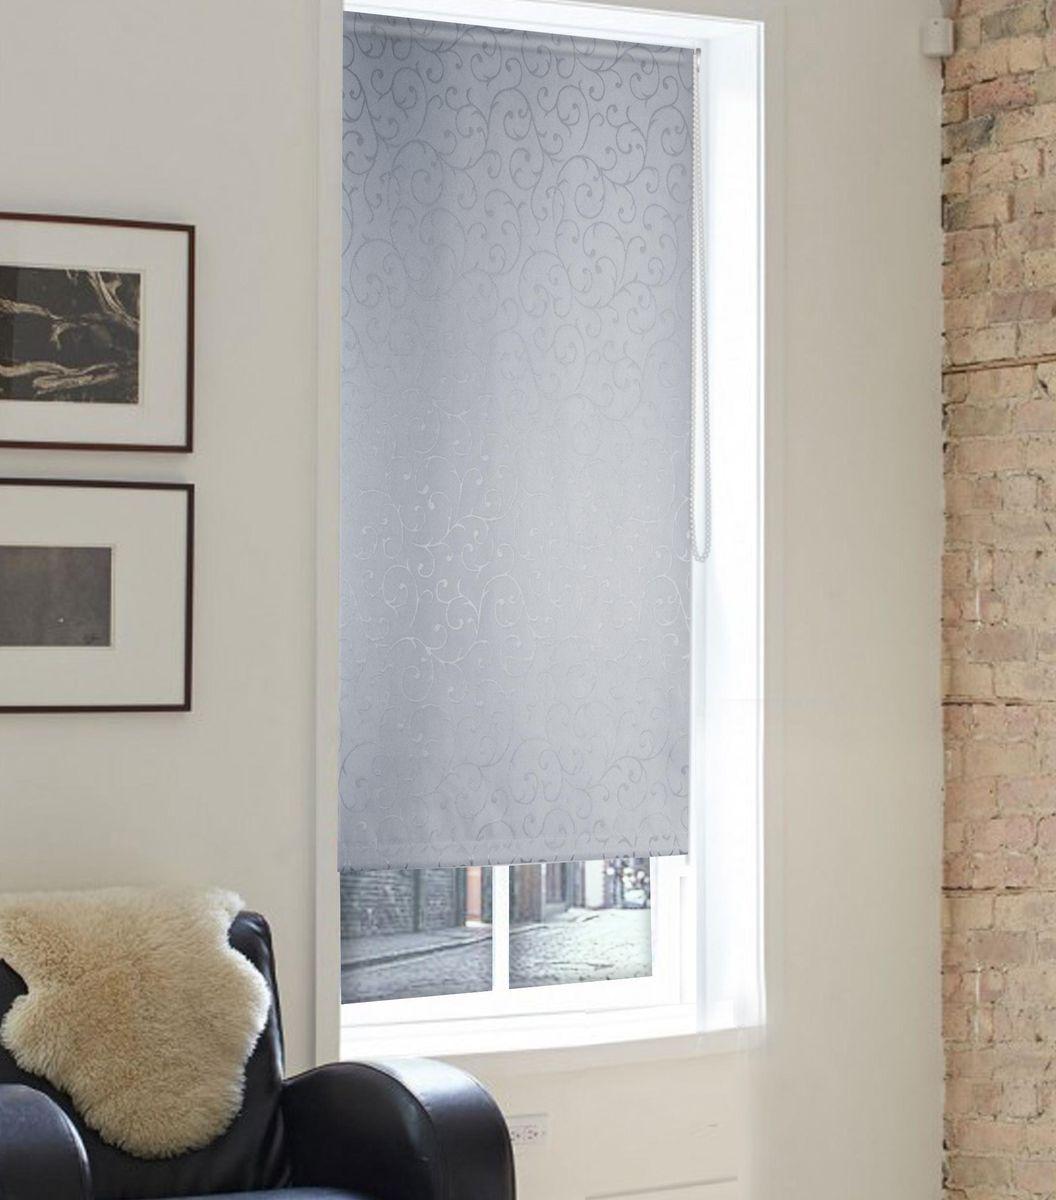 "Штора рулонная Эскар ""Ролло. Агат"", цвет: серый, ширина 80 см, высота 160 см"